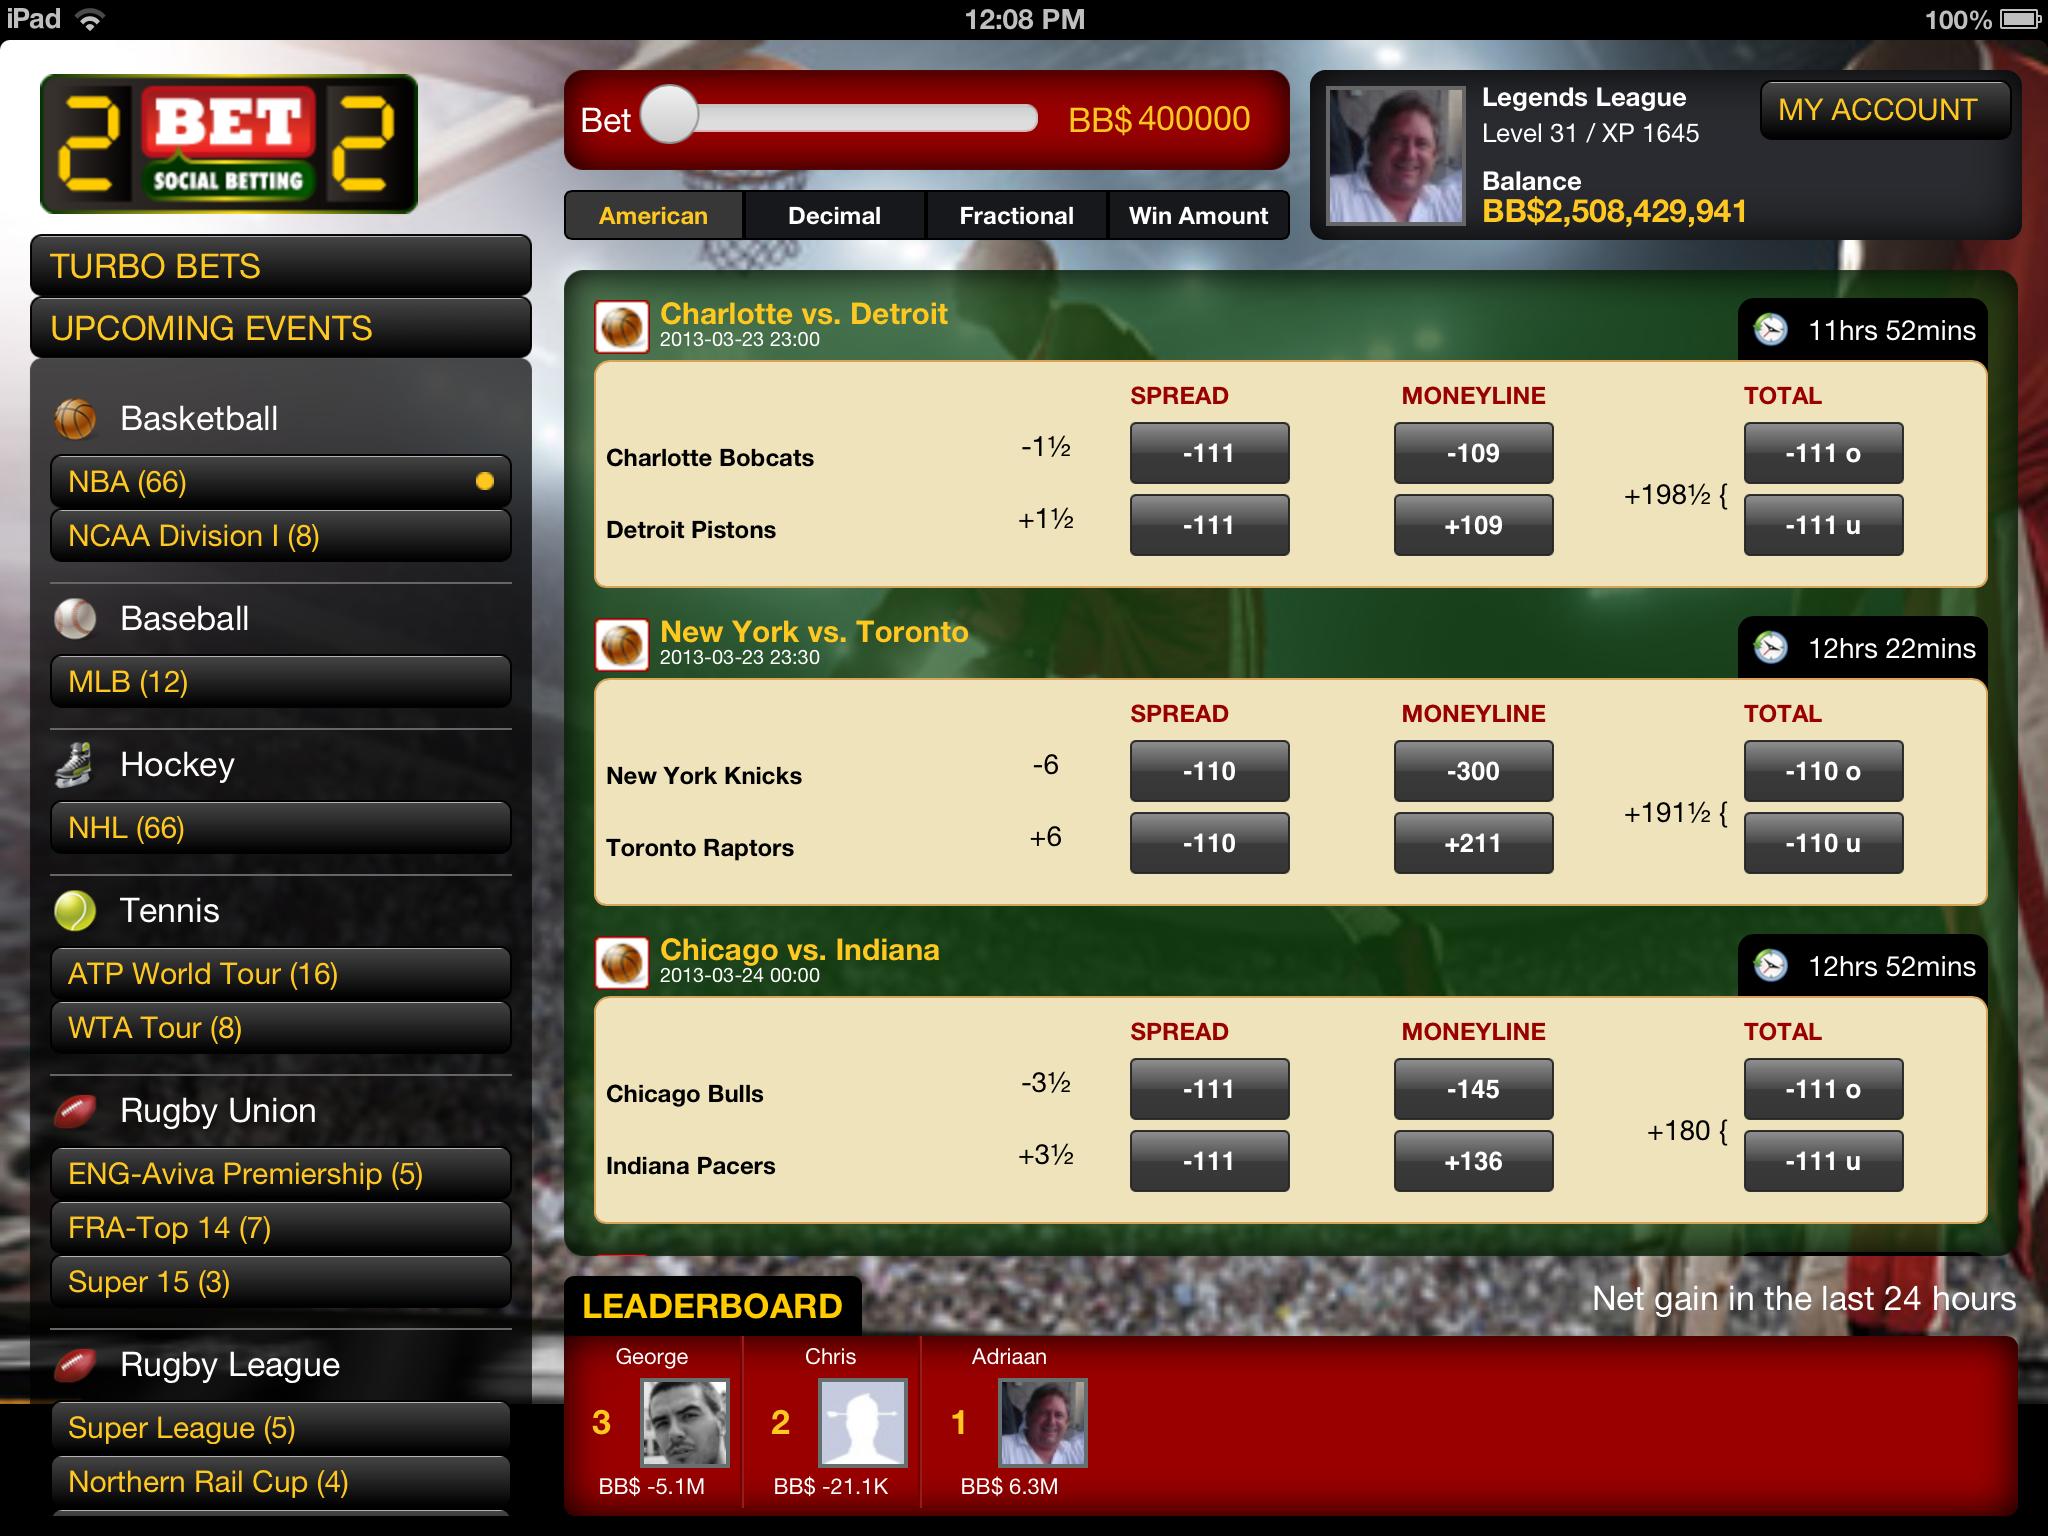 2BET2 Sports Betting iPad App